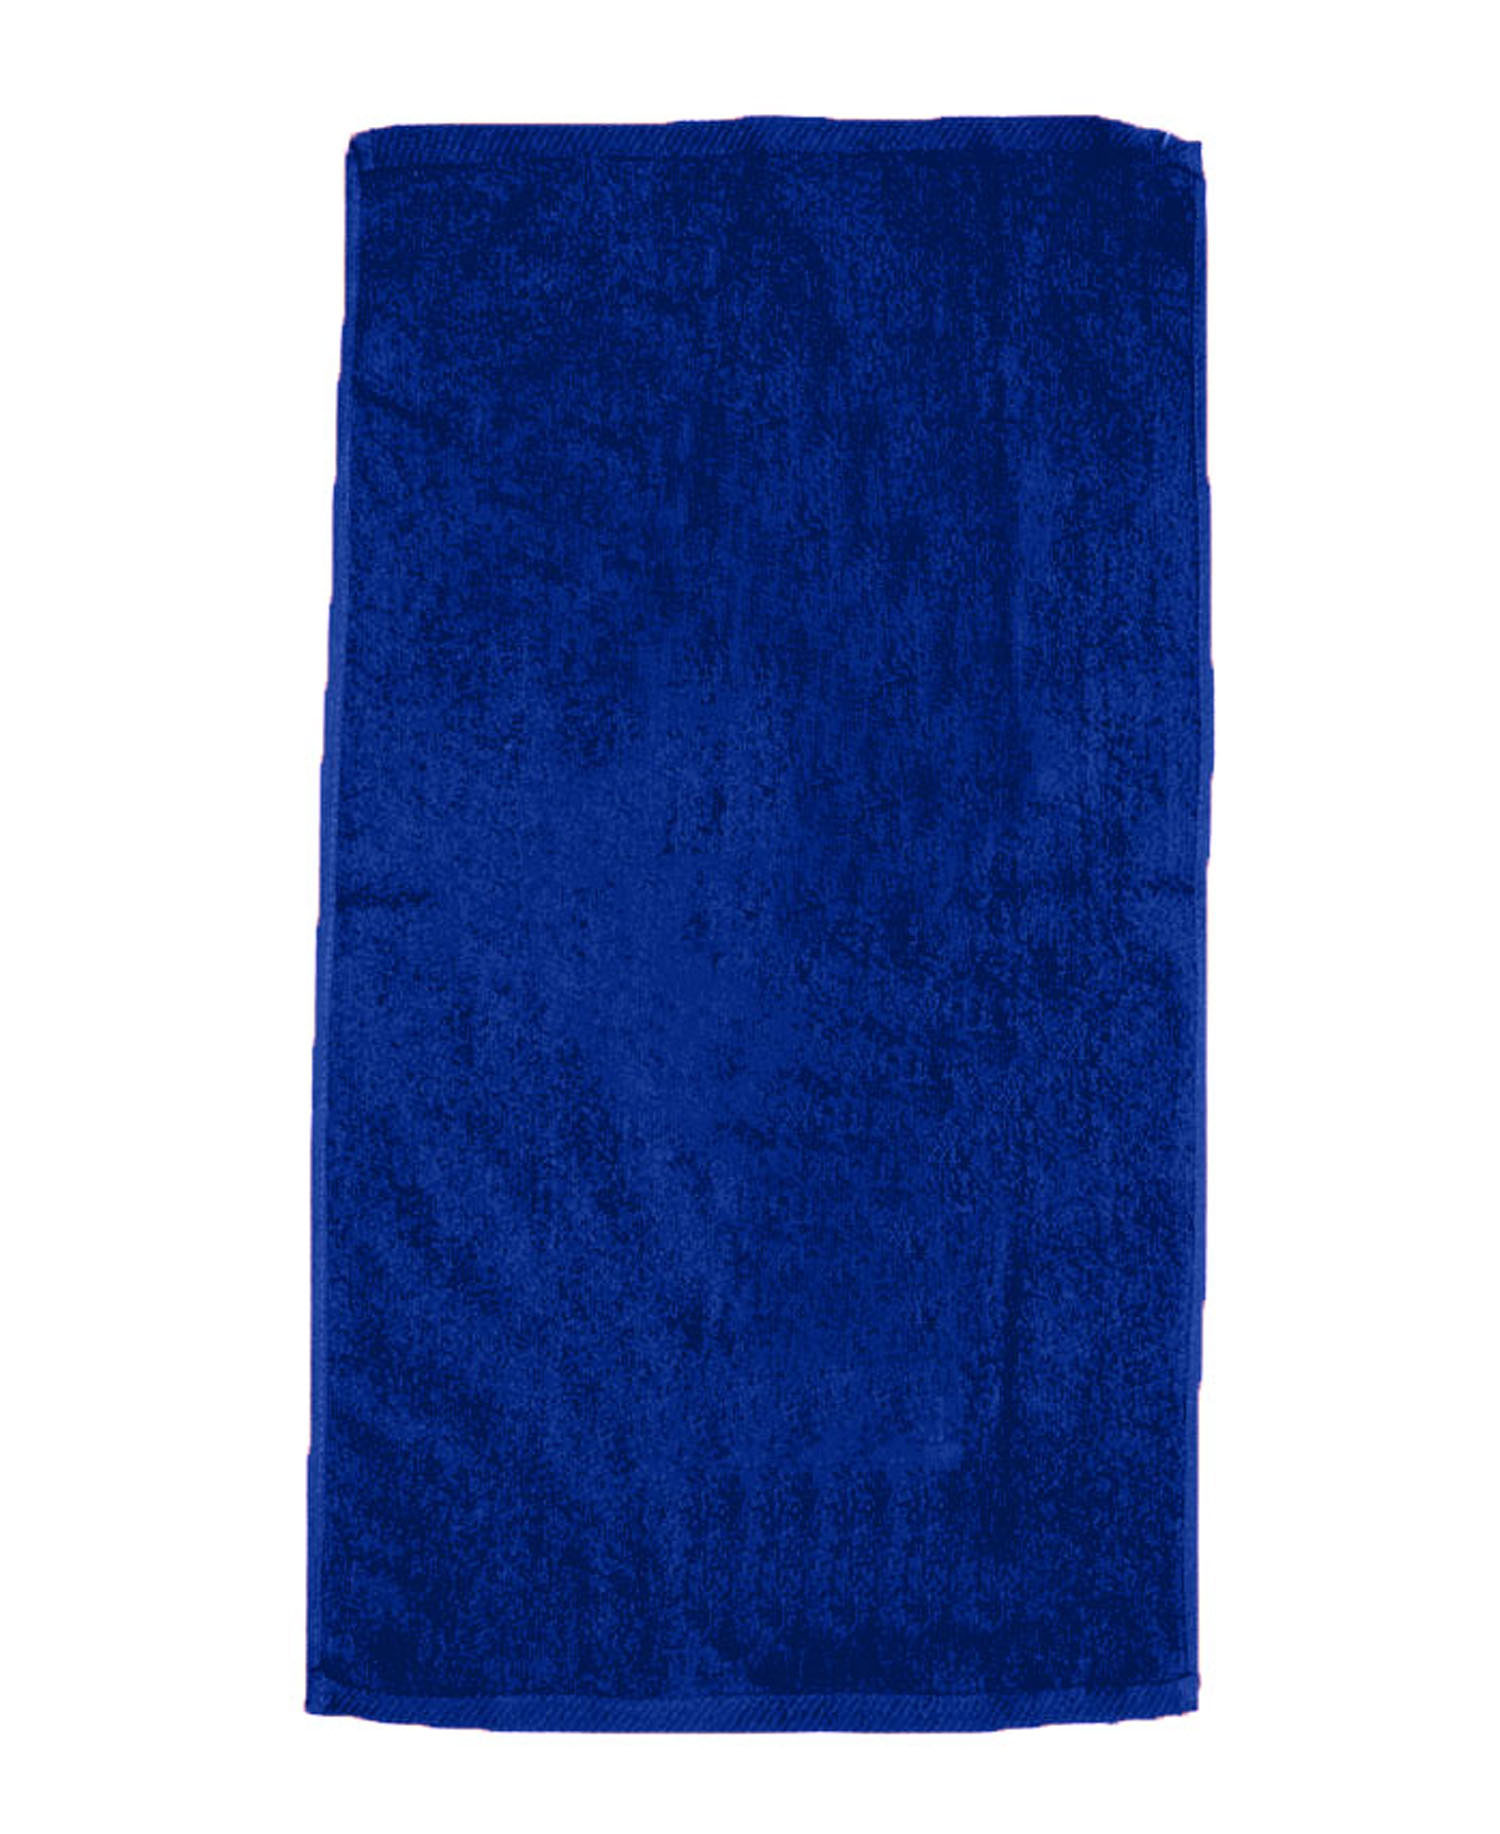 Q-Tees of California - QV3060 Q-Tees of California Velour Beach Towel